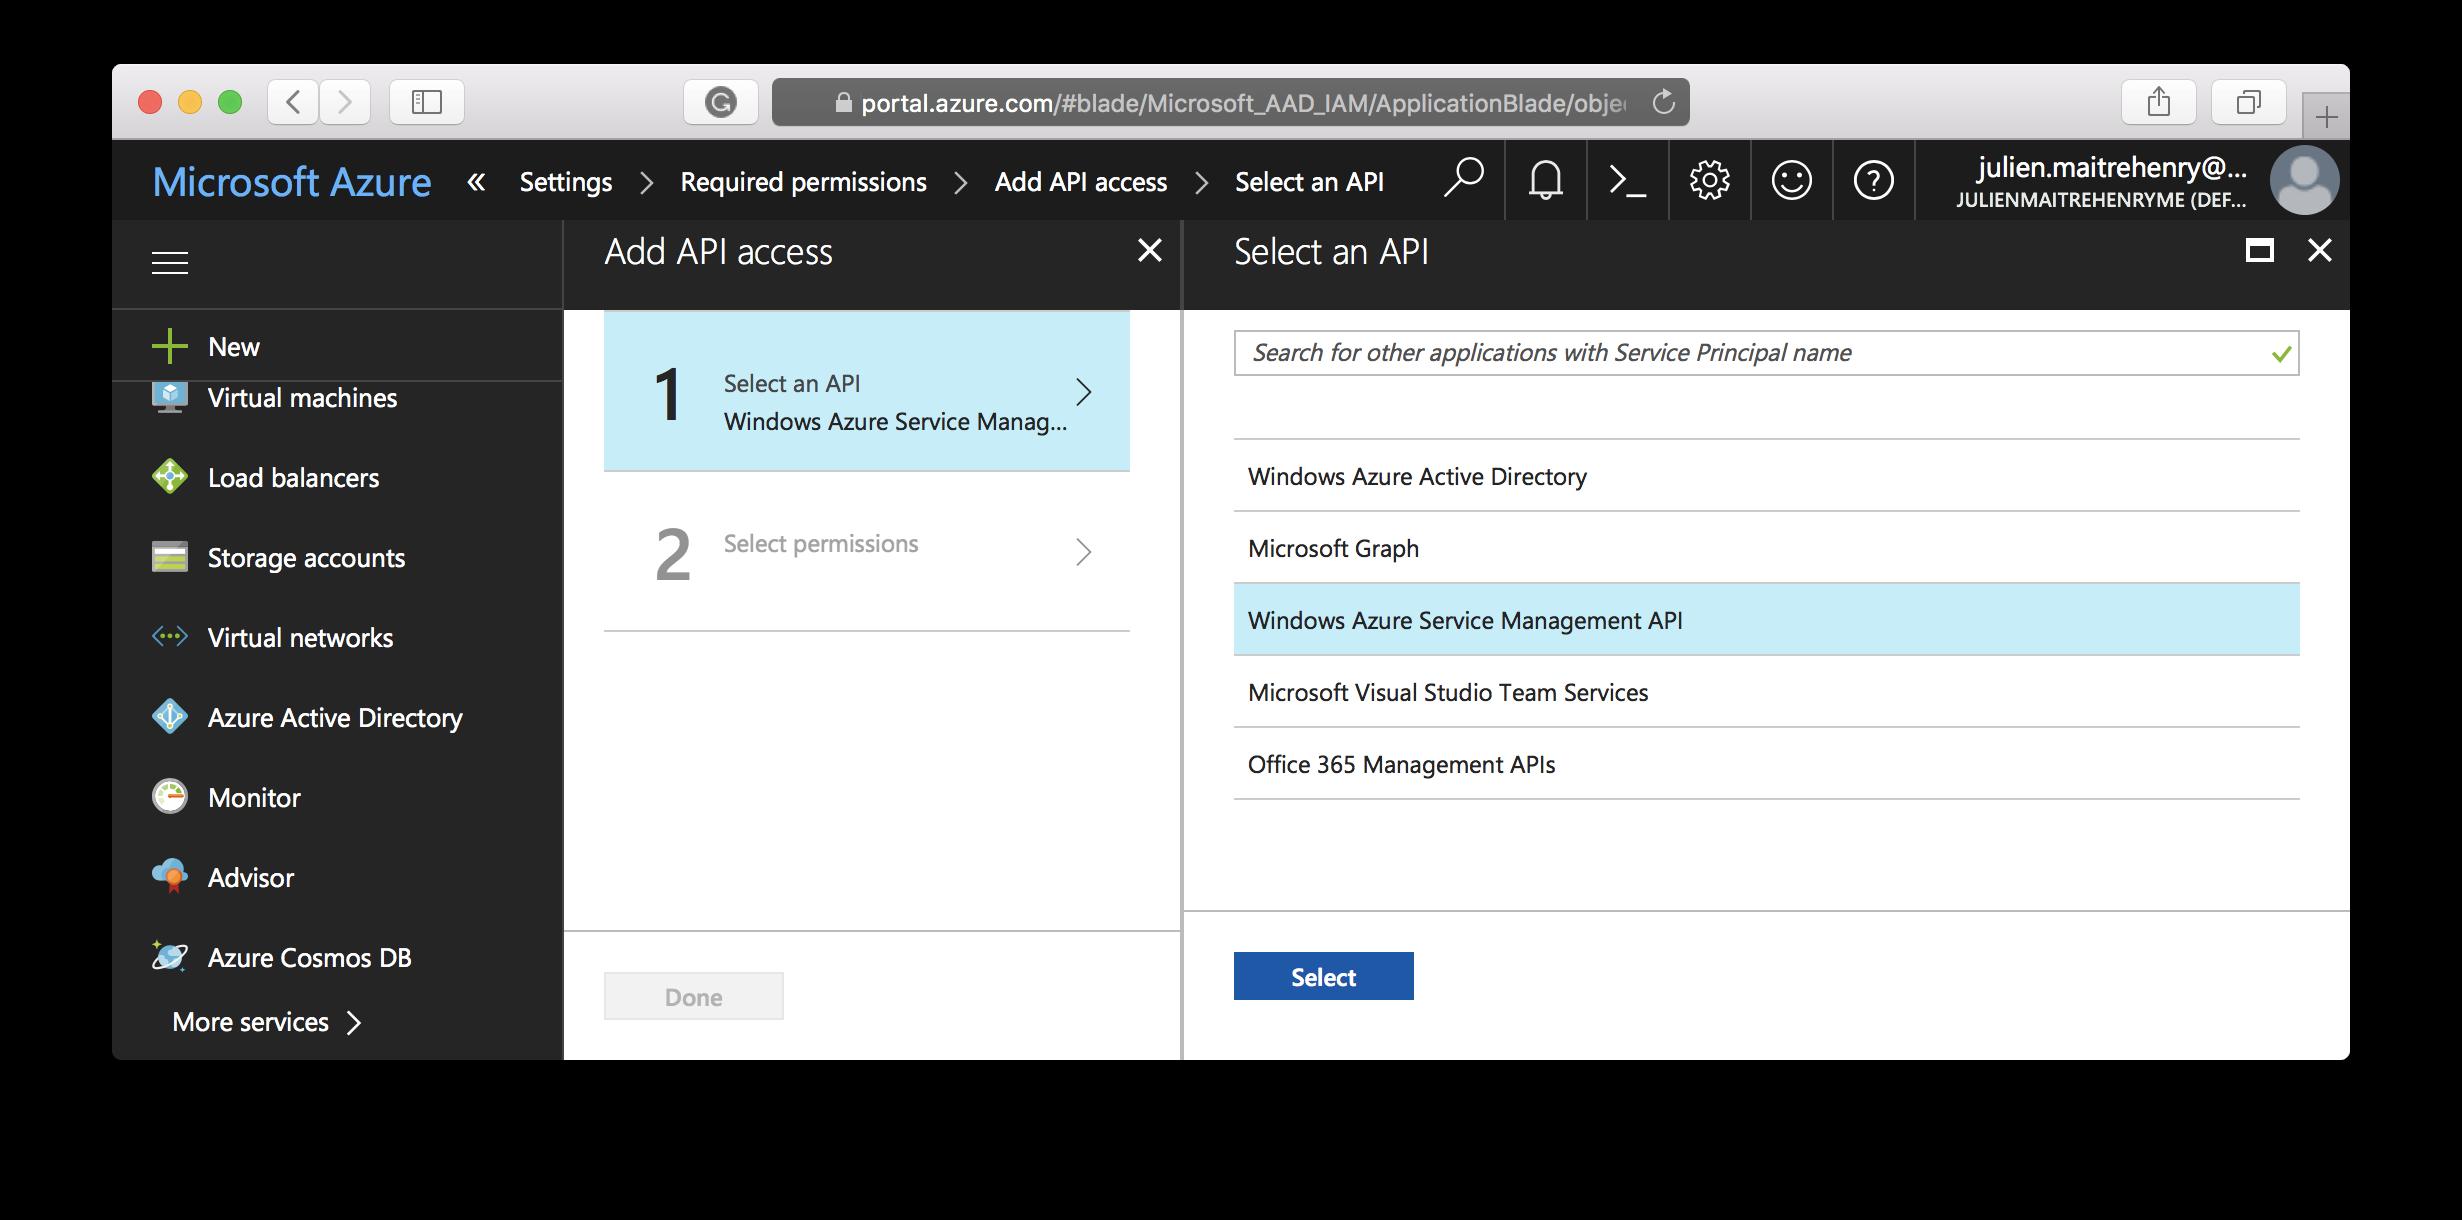 Application - Select API